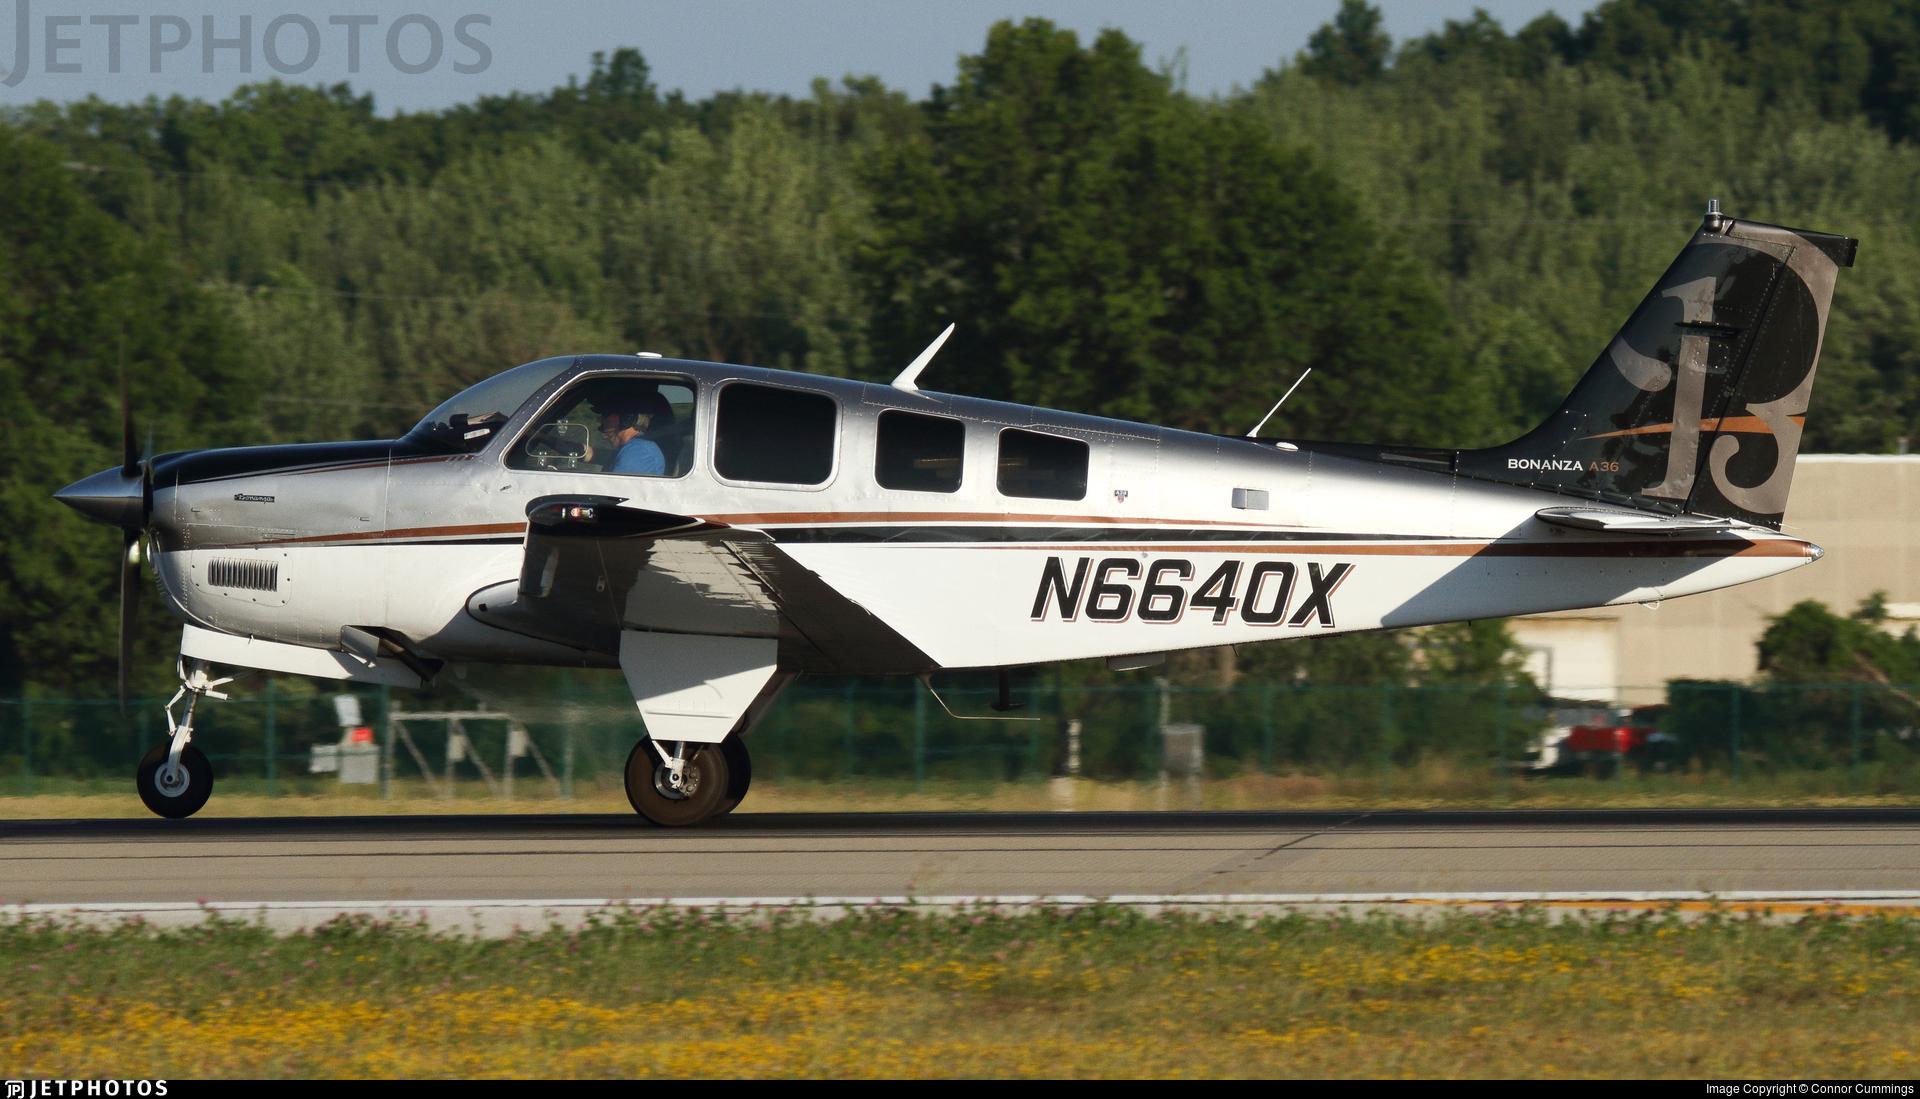 N6640X - Beech A36 Bonanza - Private